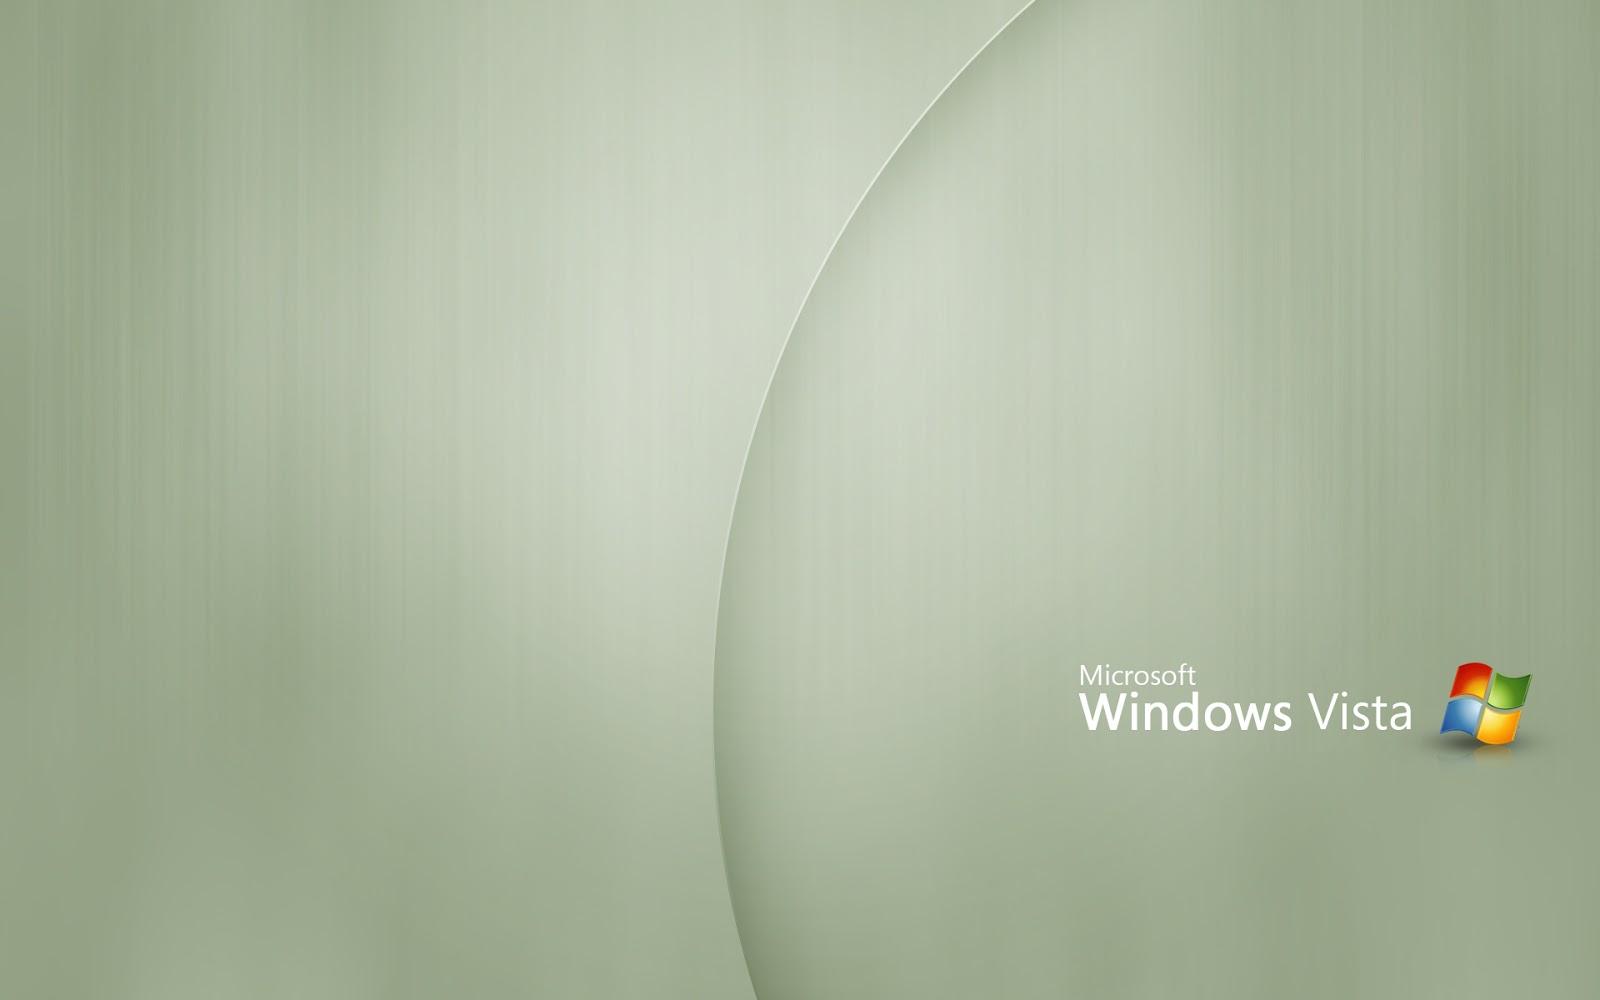 Group Of Microsoft Windows Vista Wallpapers